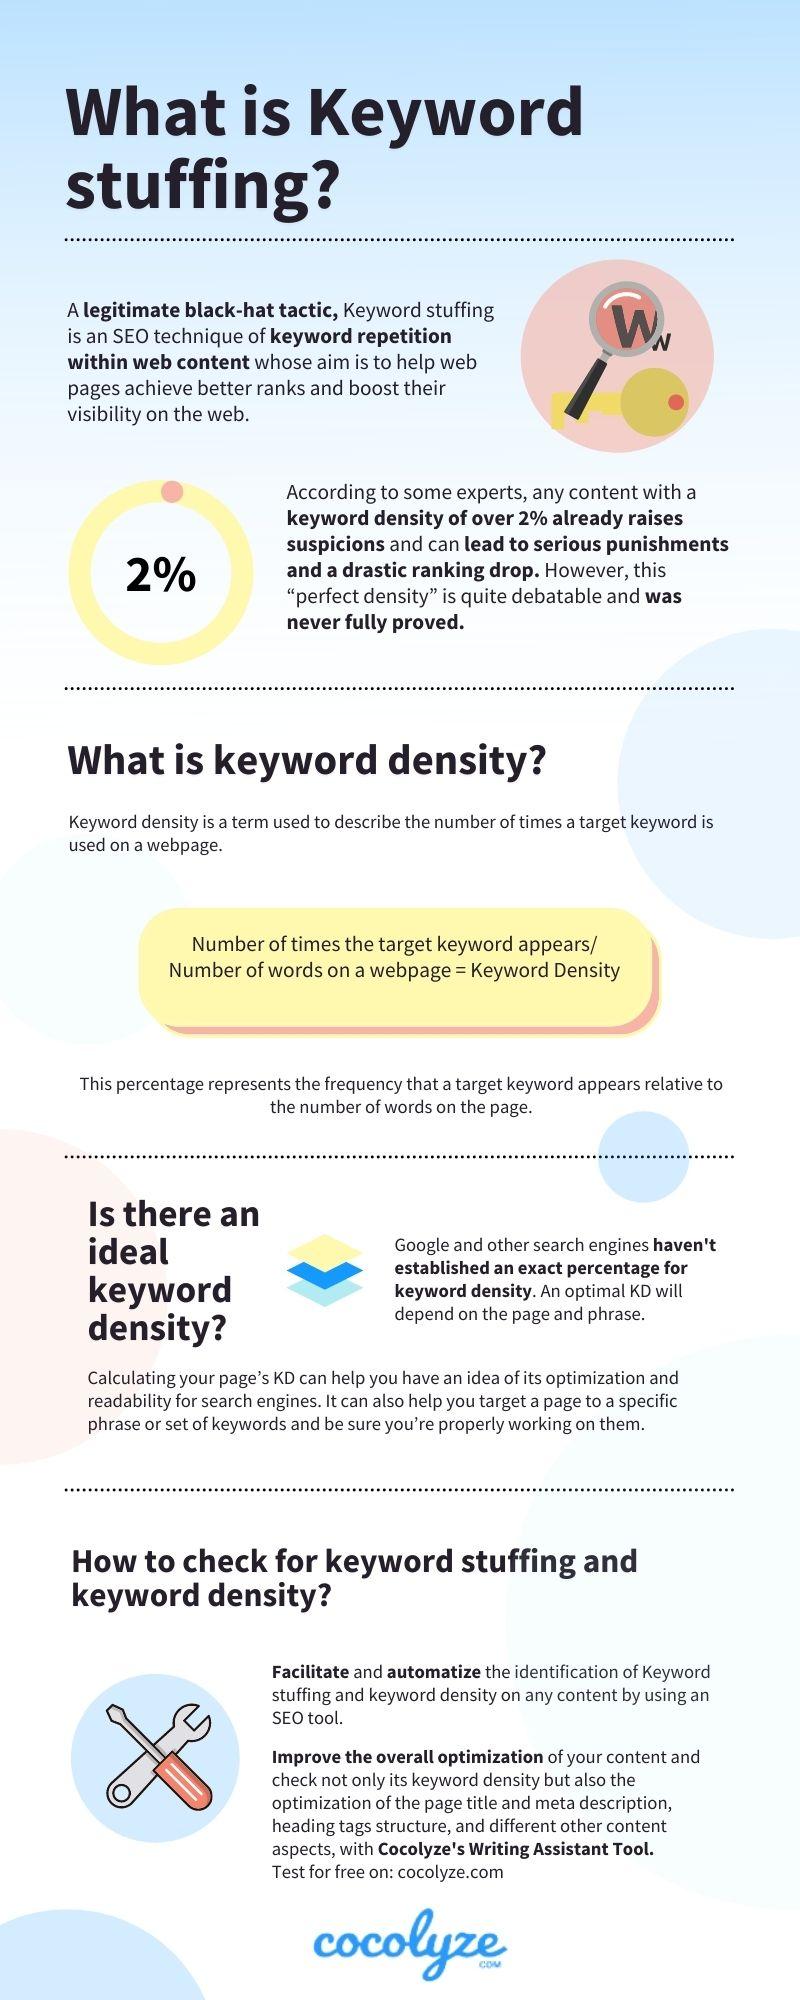 Keyword stuffing and keyword density